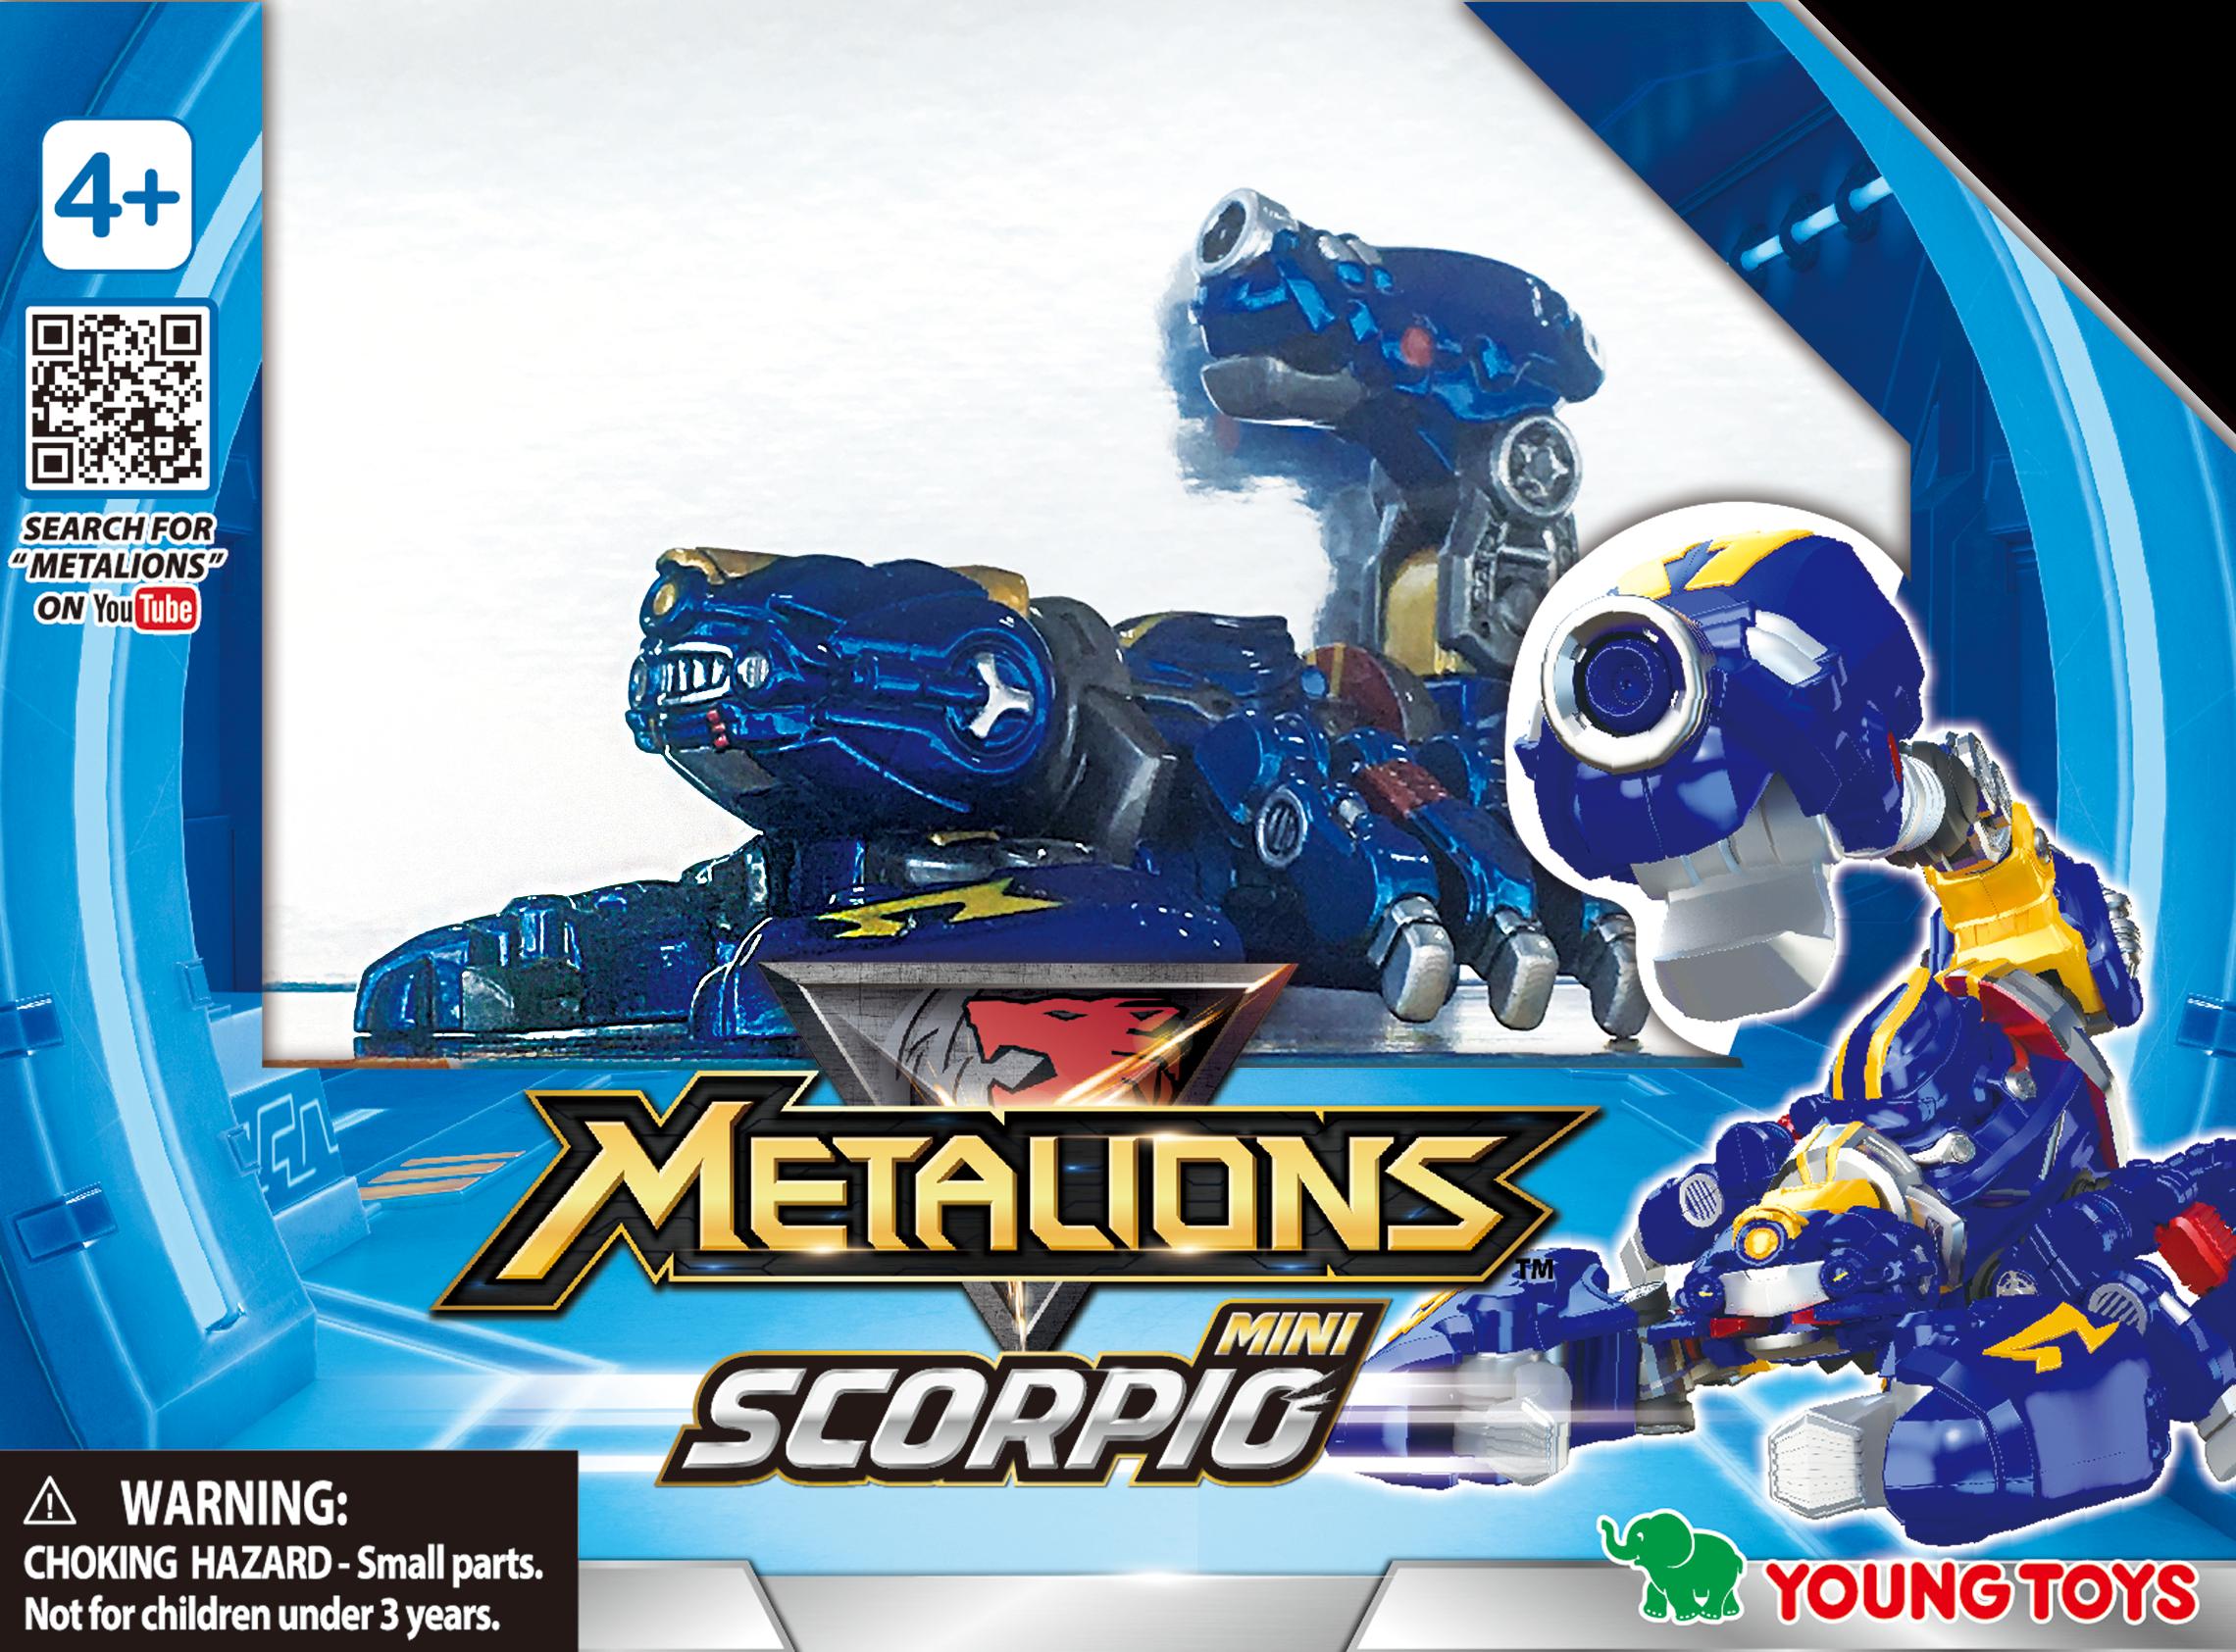 YOUNG TOYS METALIONS Mini Scorpio Action Figure